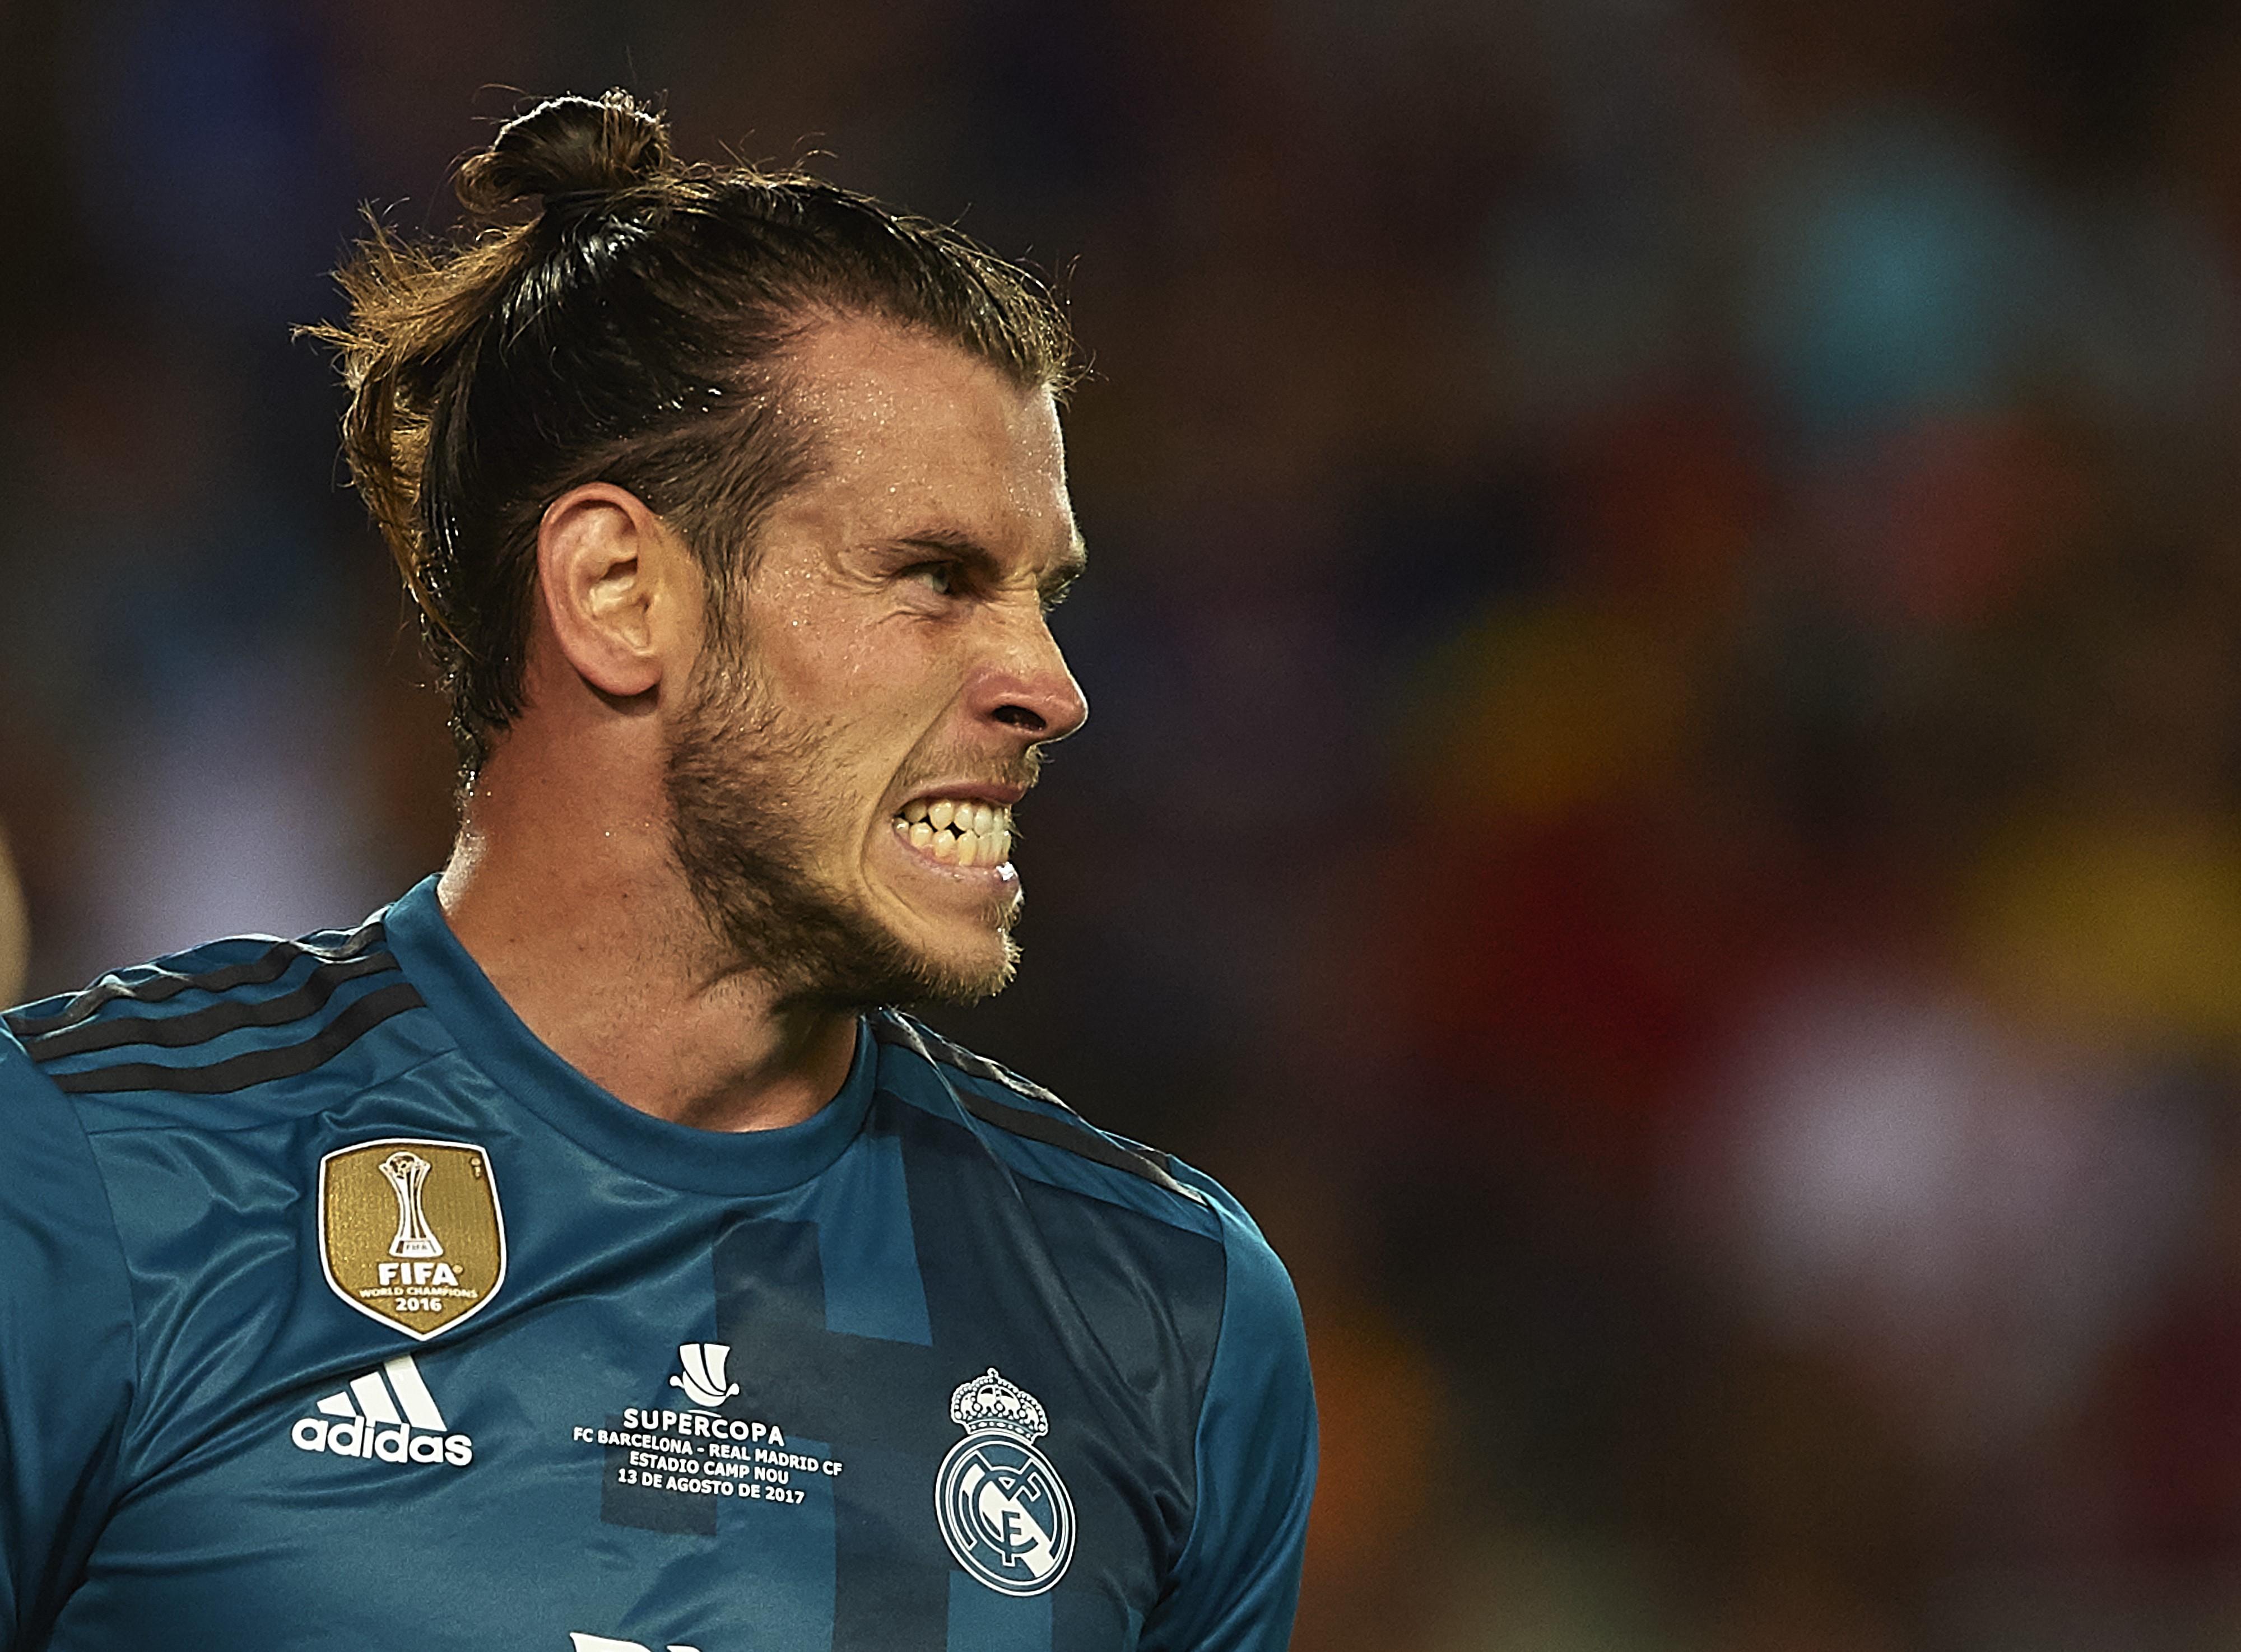 Гарет Бэйл (Реал Мадрид) недоволен